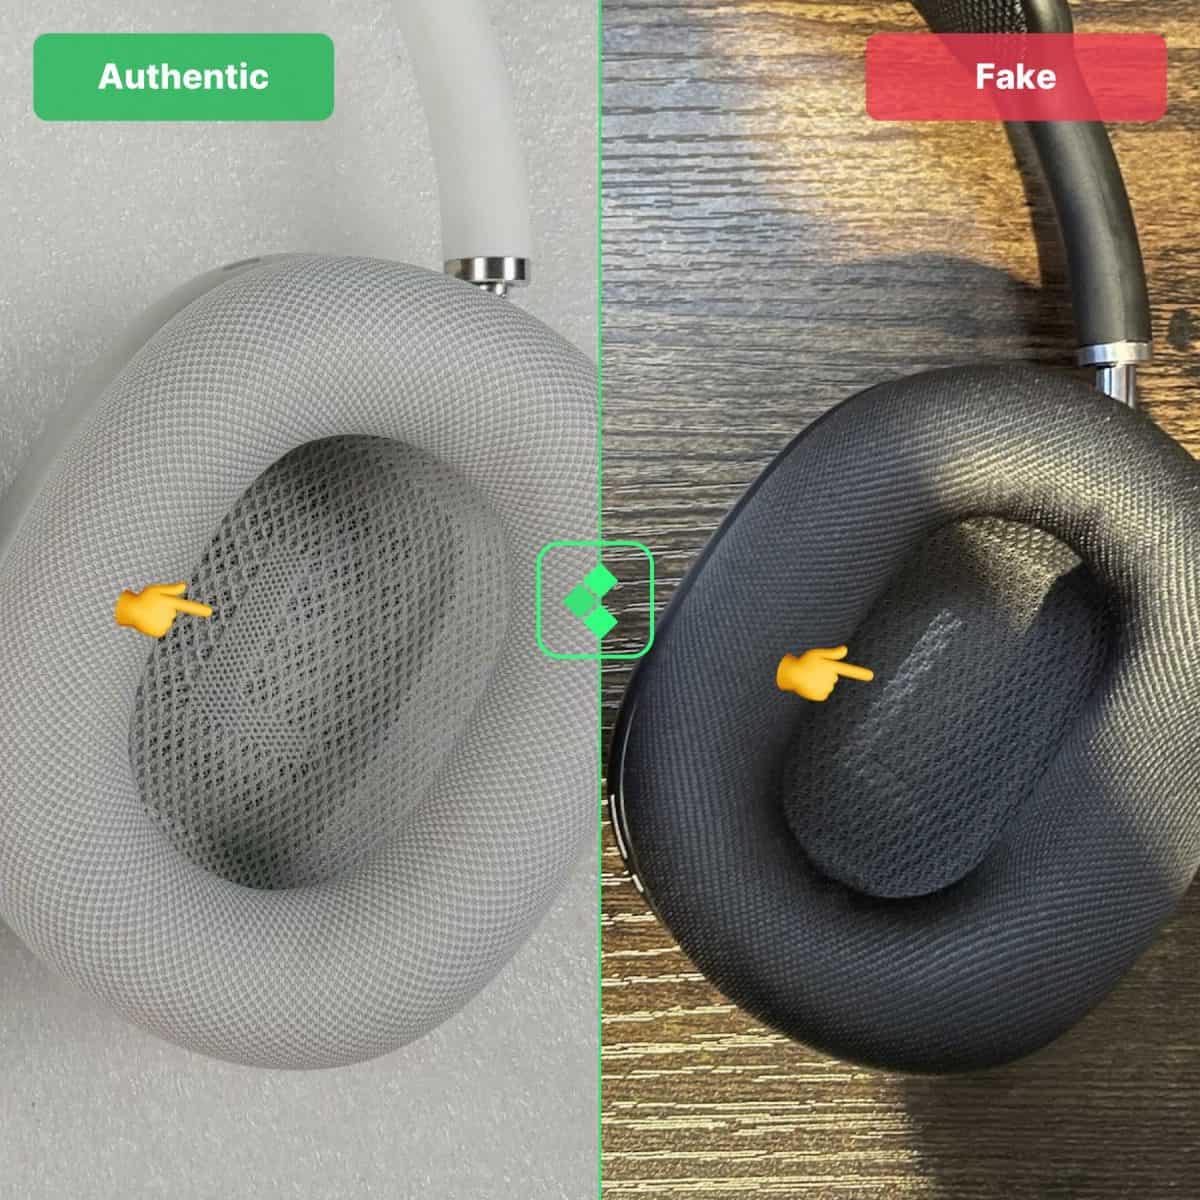 airpods max super copy vs real